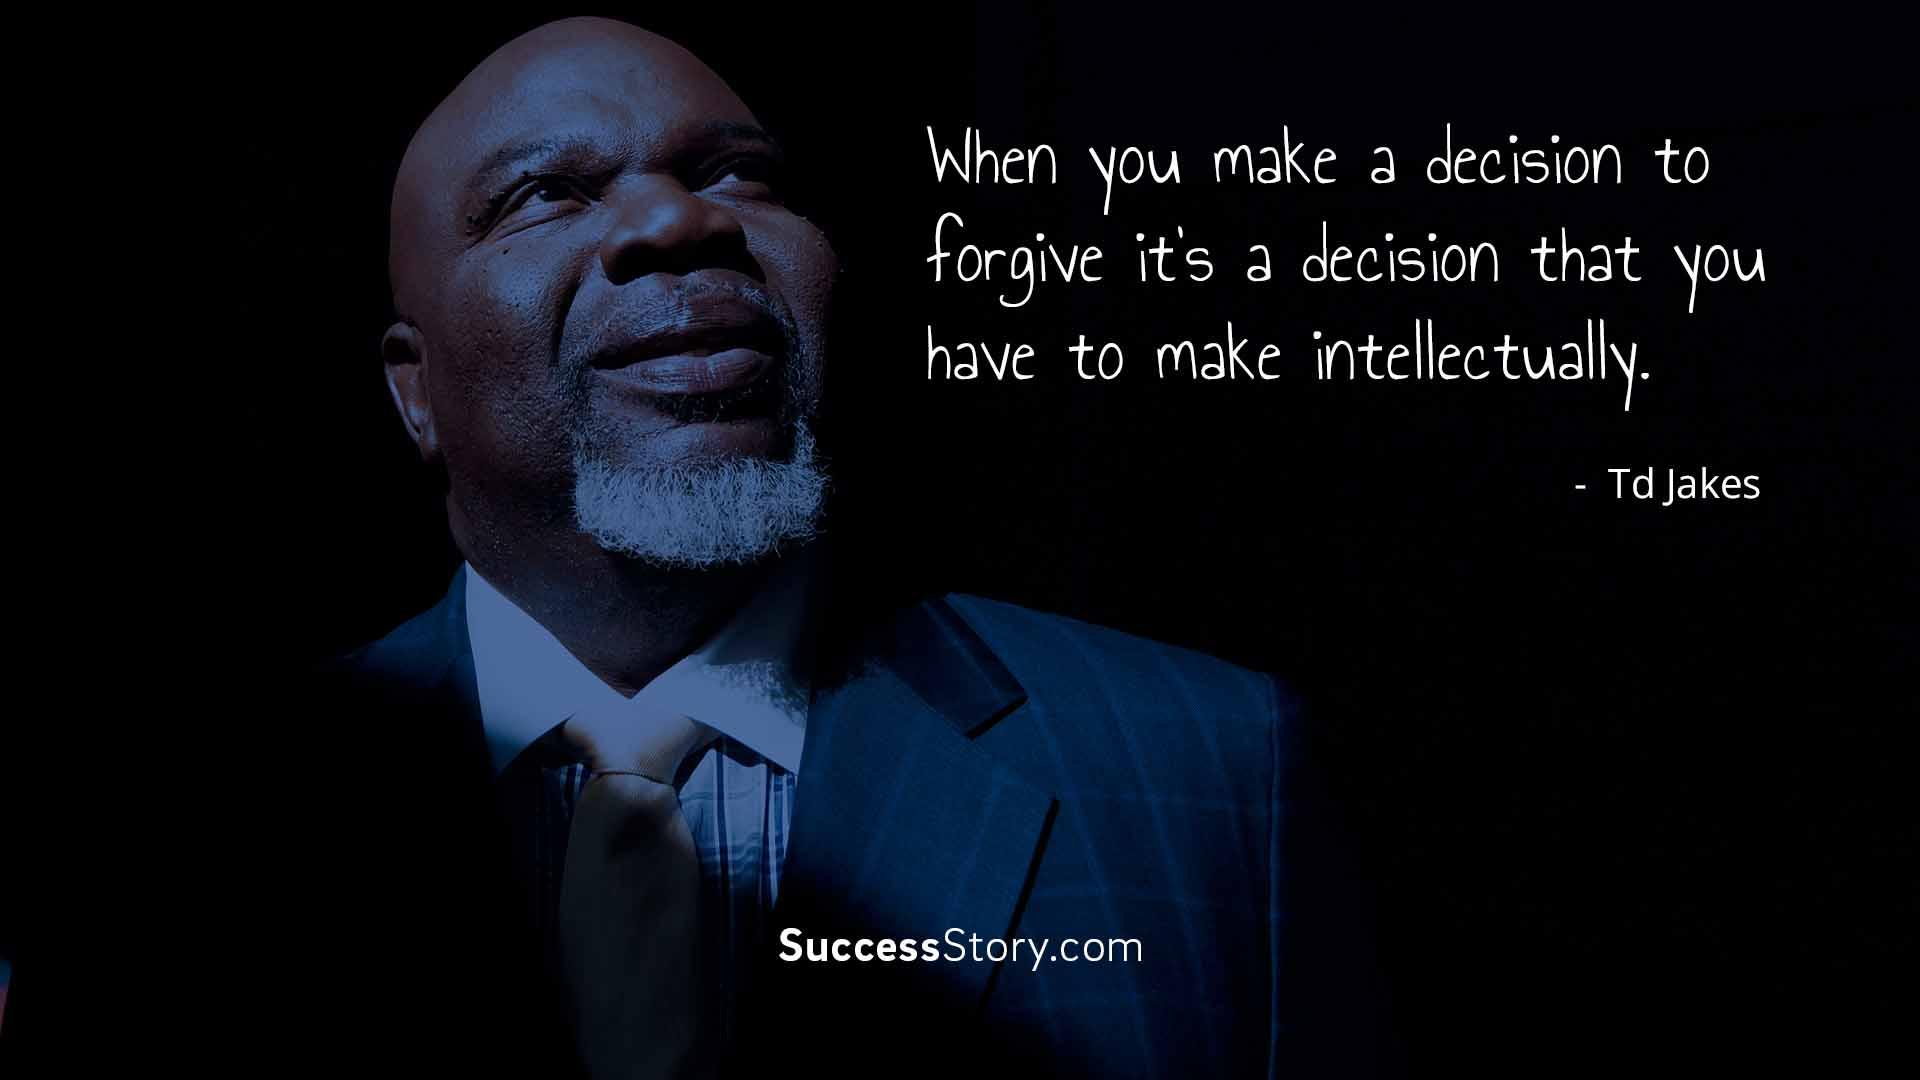 When you make a decision